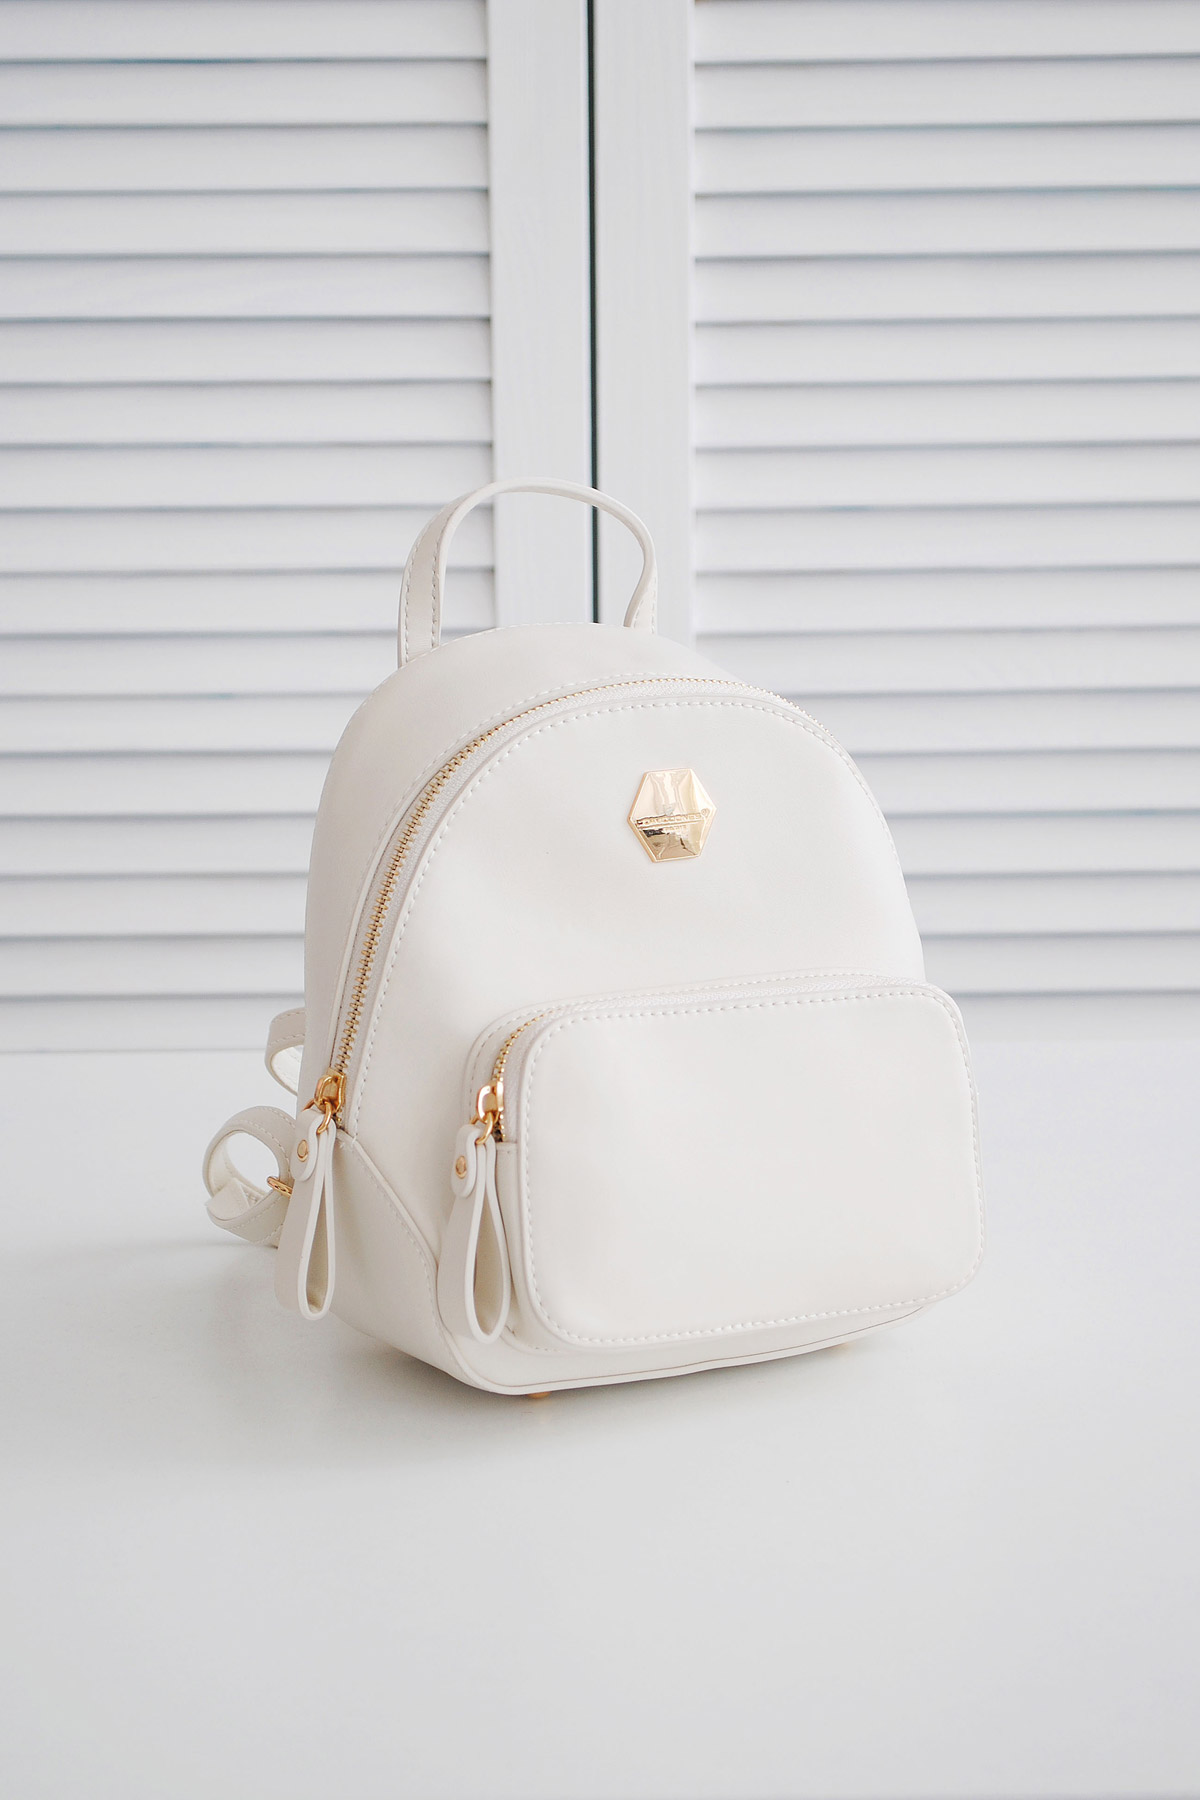 98bf63d3d9b9 женский мини рюкзак белого цвета. Рюкзак 5526-2. Цвет  белый